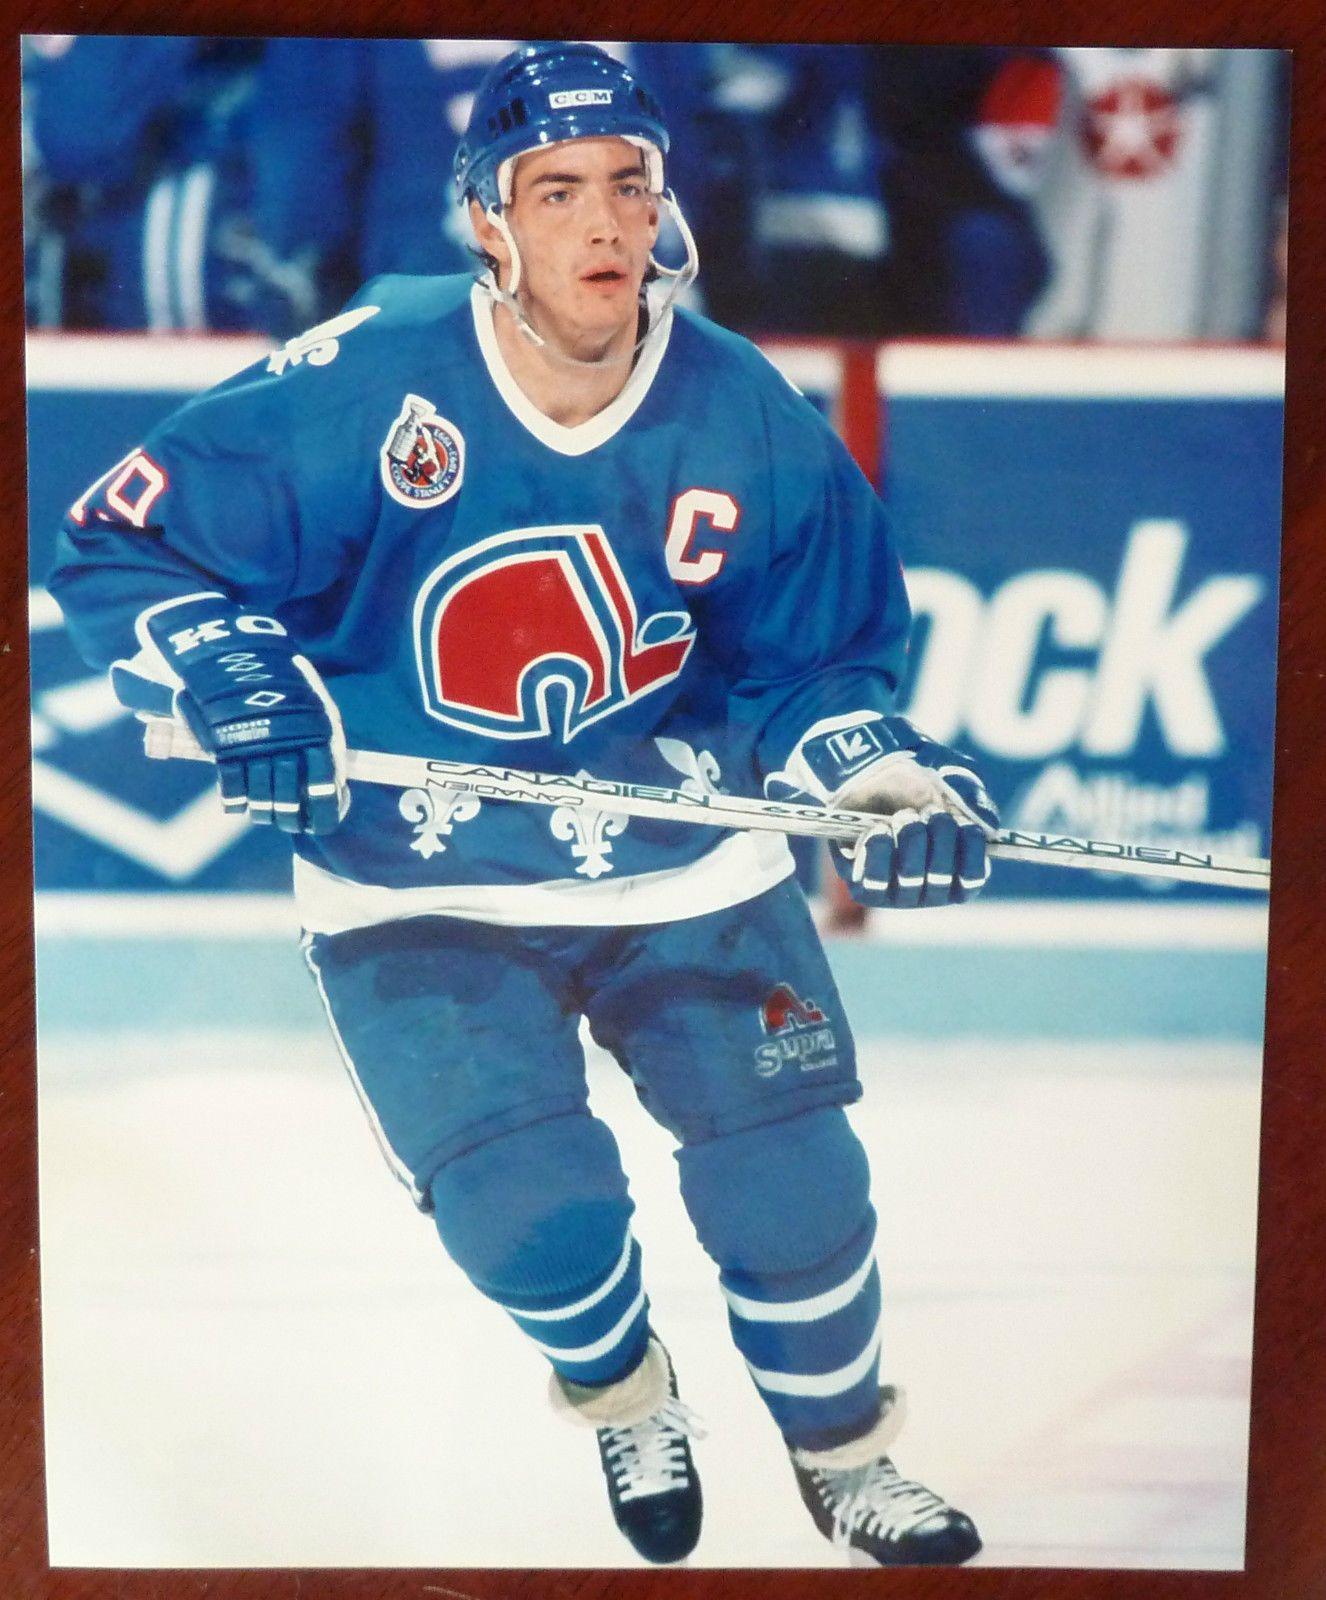 Nhl Quebec Nordiques 19 Joe Sakic 8 X 10 Photo Official Sports Photos Ebay